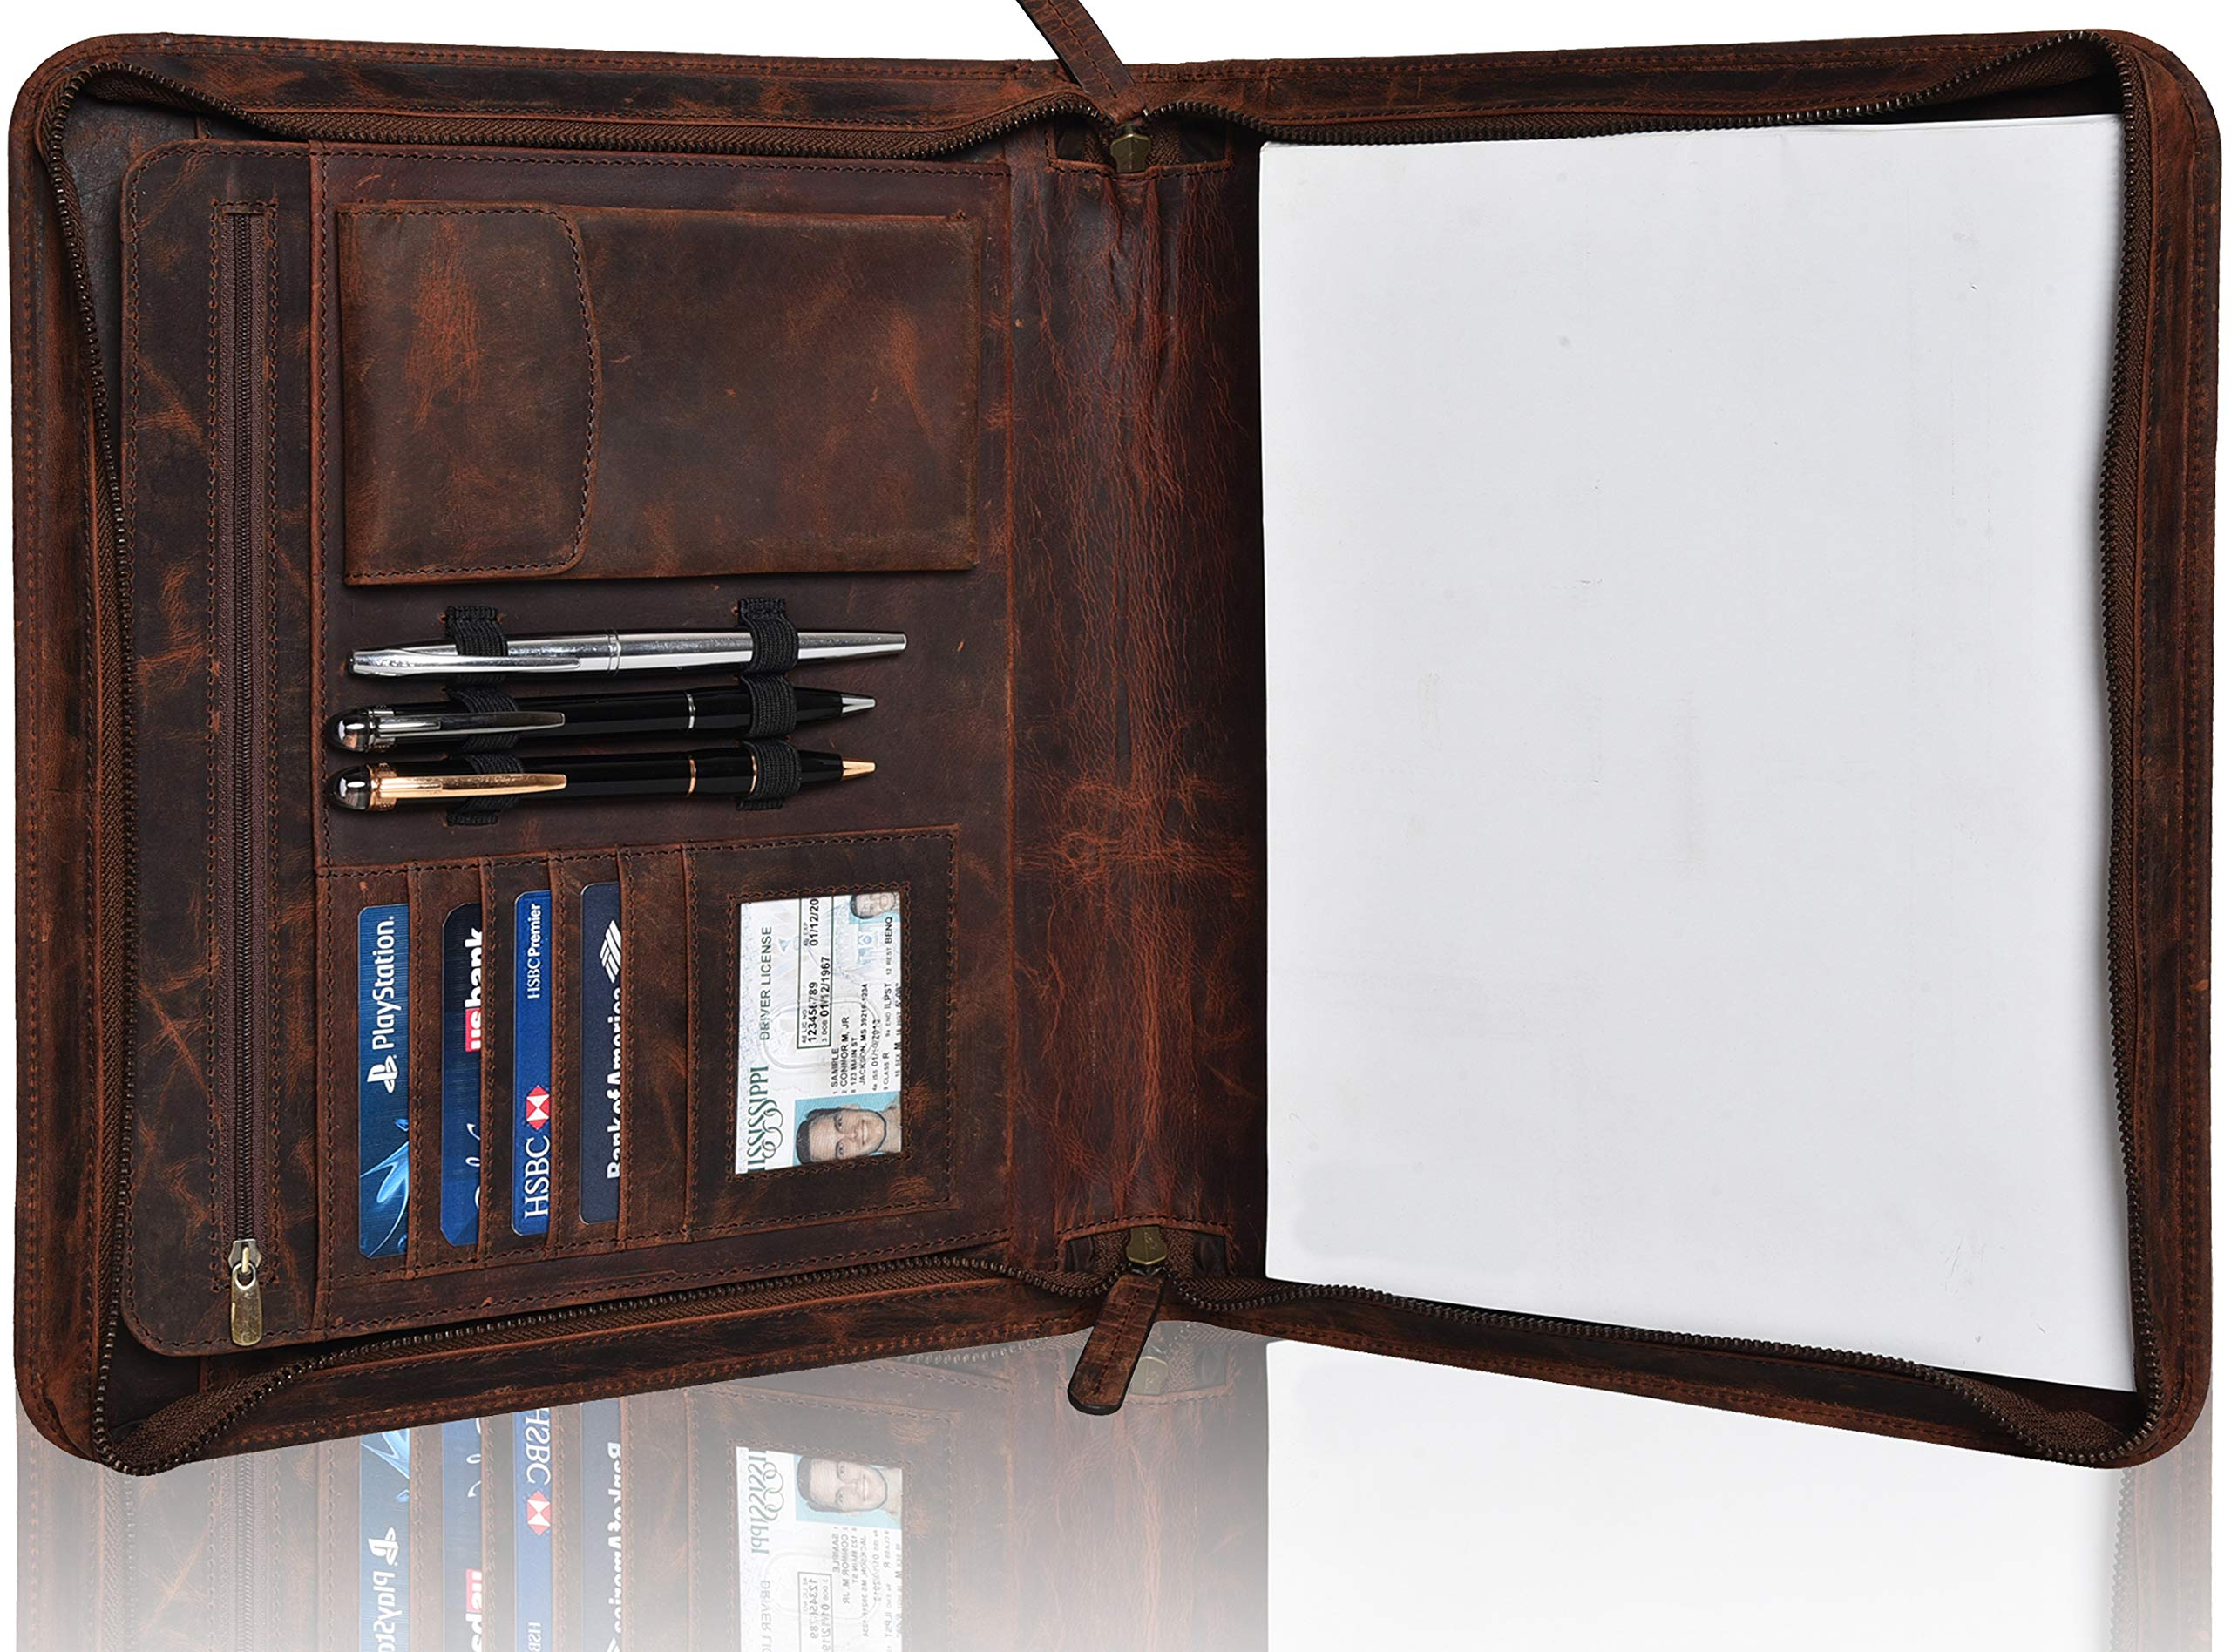 Leather Business Padfolio Portfolio for Men - Professional Executive Zippered Binder Folder 13.5 x 11 Inches Notepad Folio School Organizer for Women (Brown Hunter)